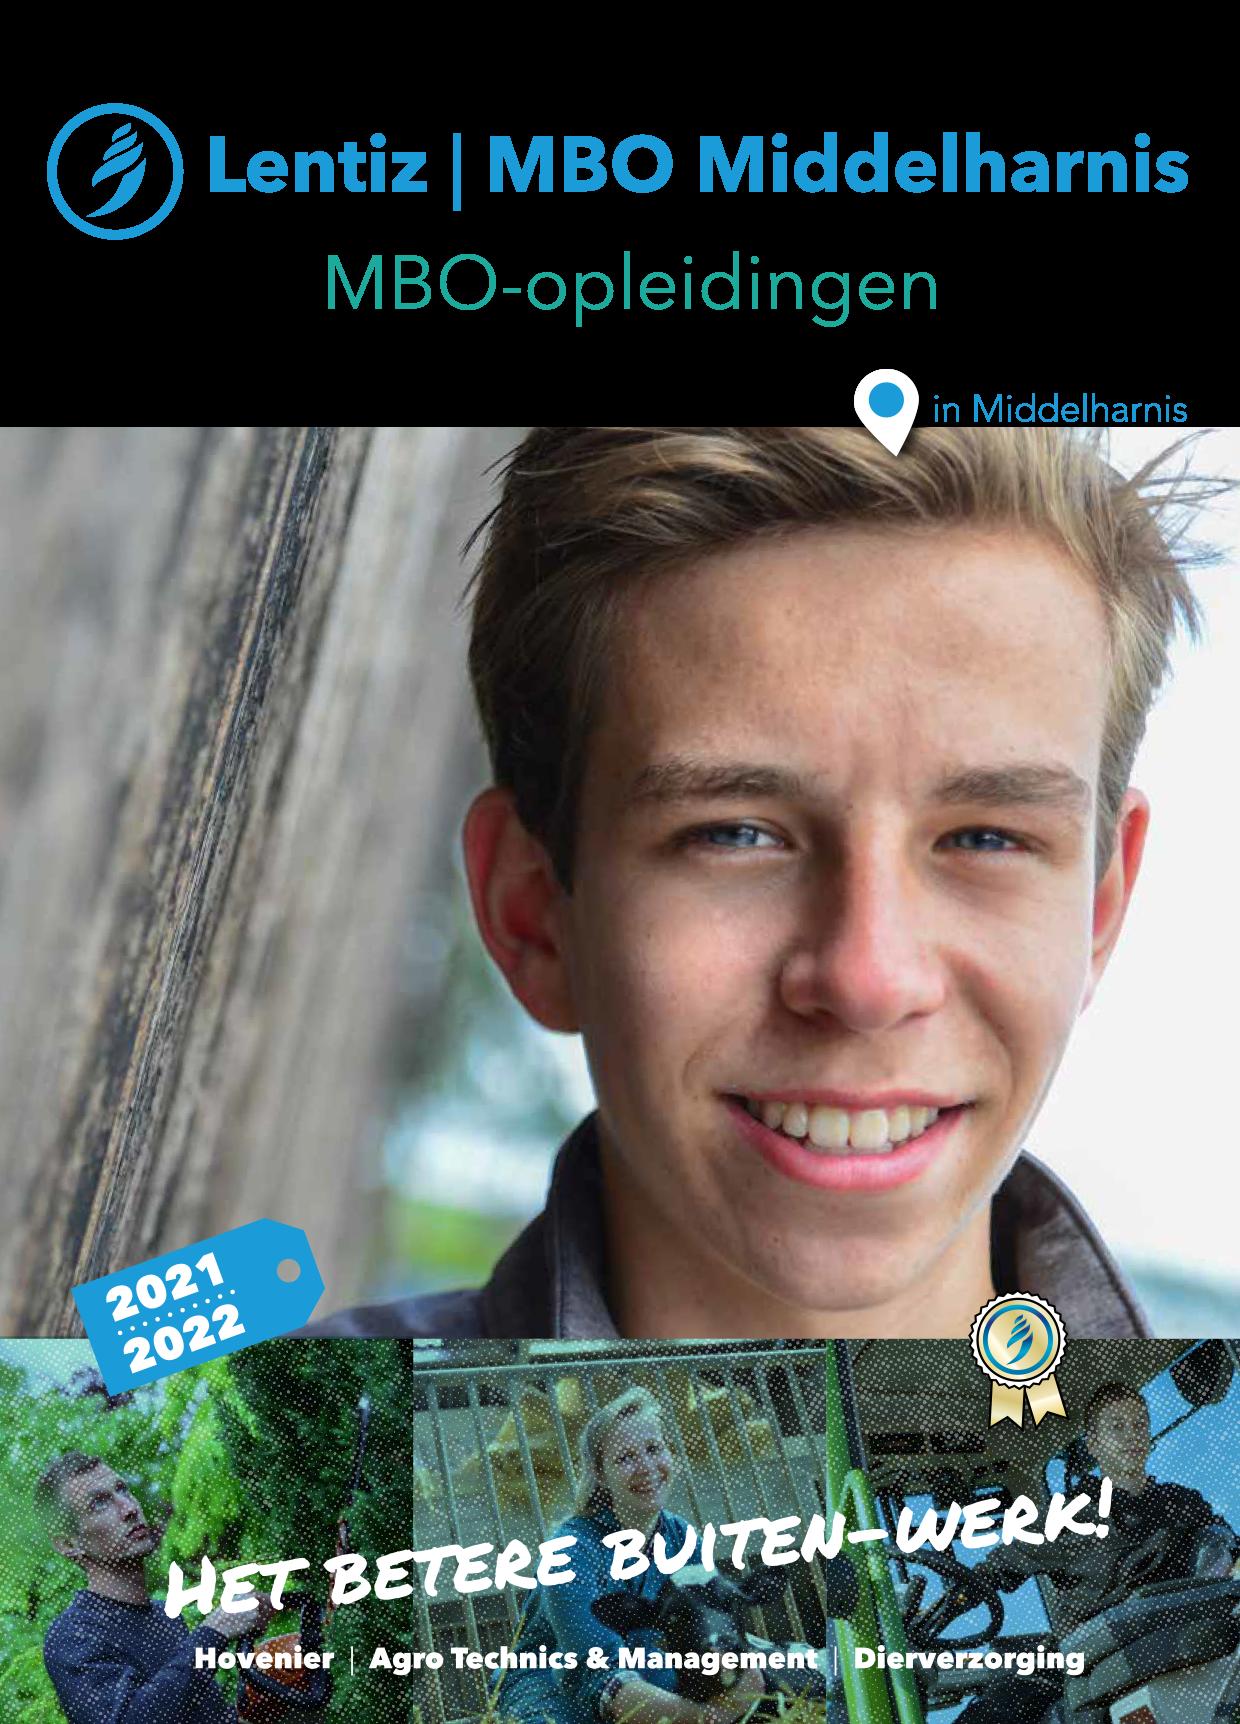 voorkant brochure Lentiz | MBO Middelharnis